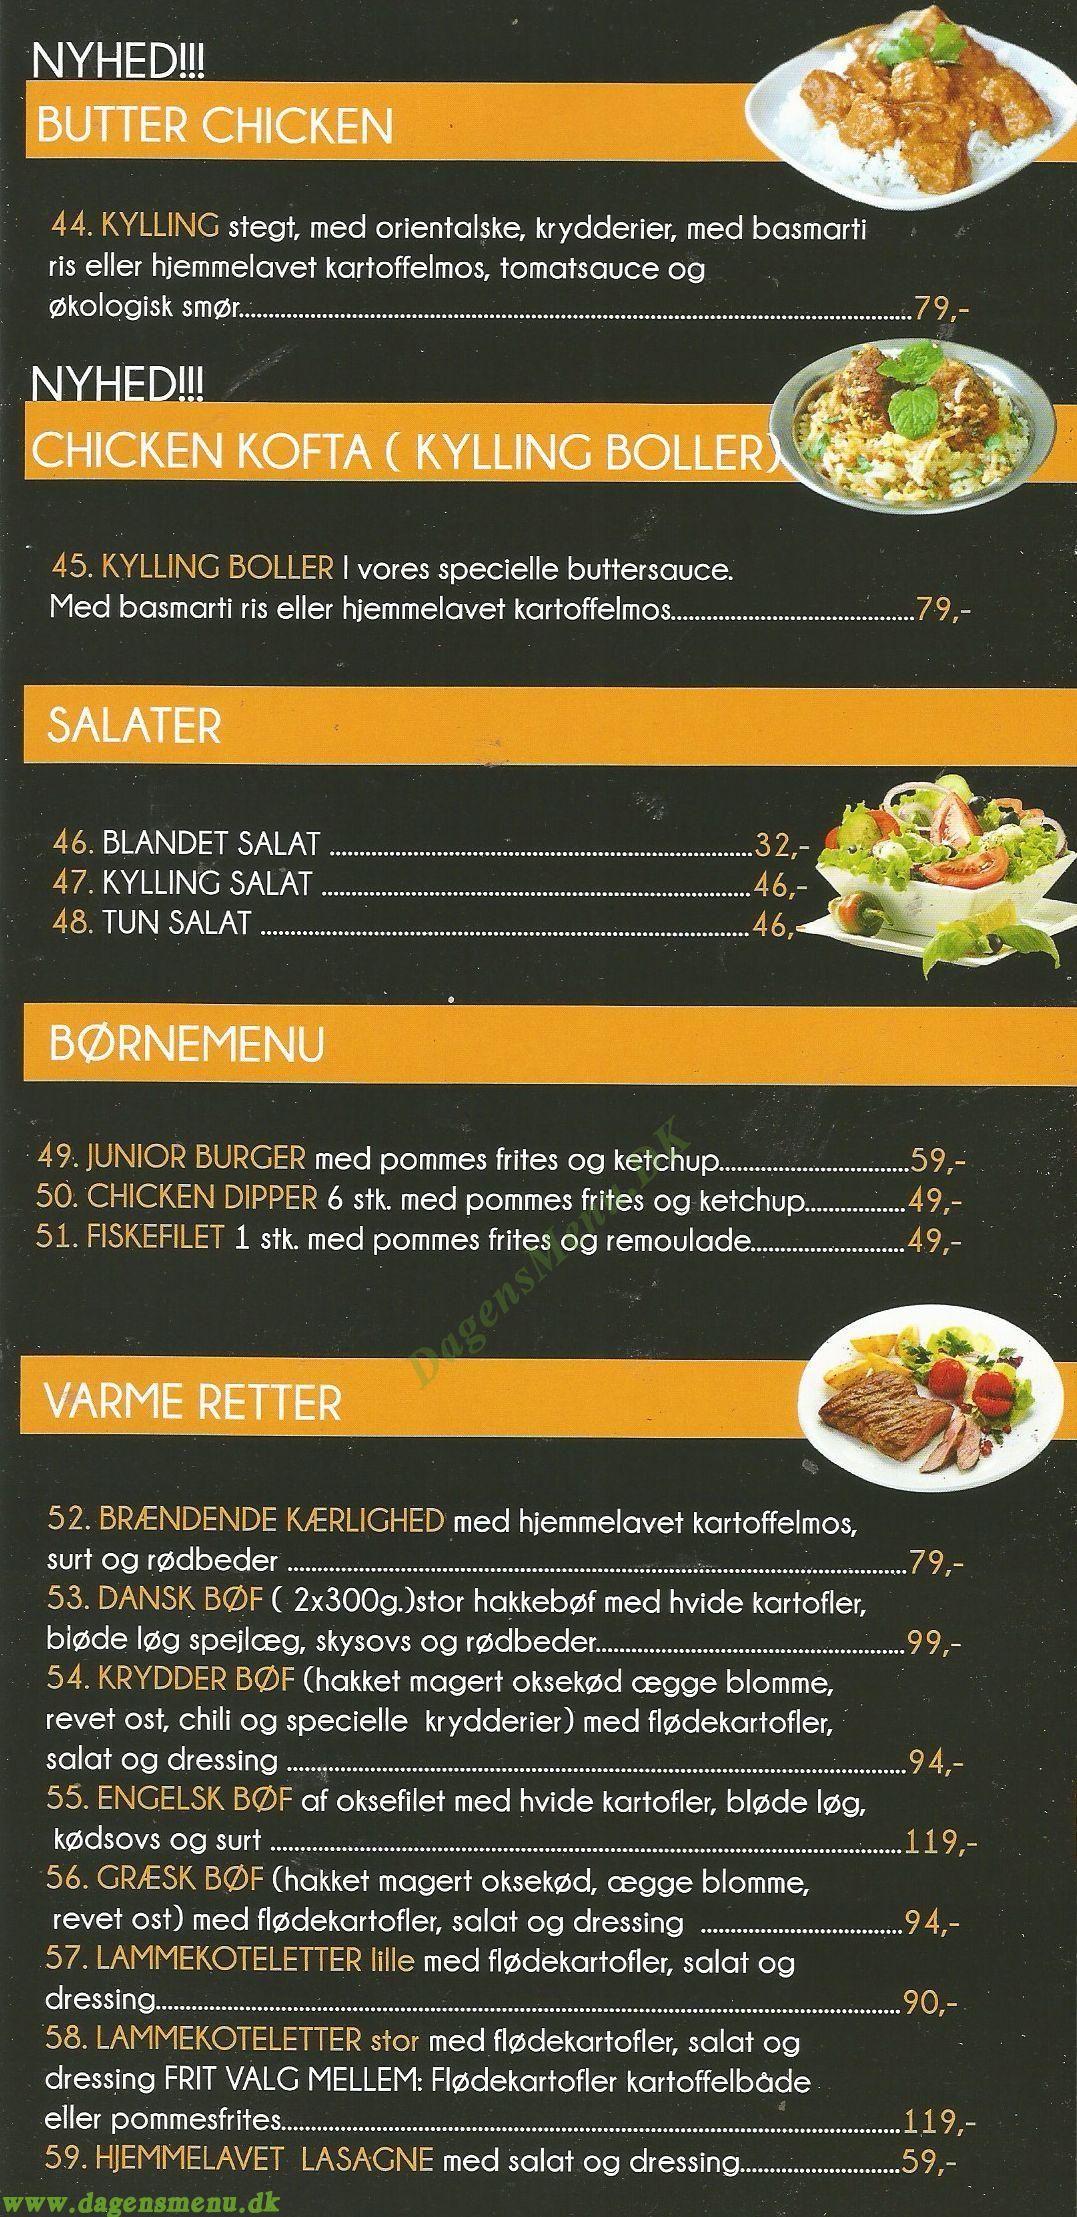 Vikinge Køkkenet - Menukort